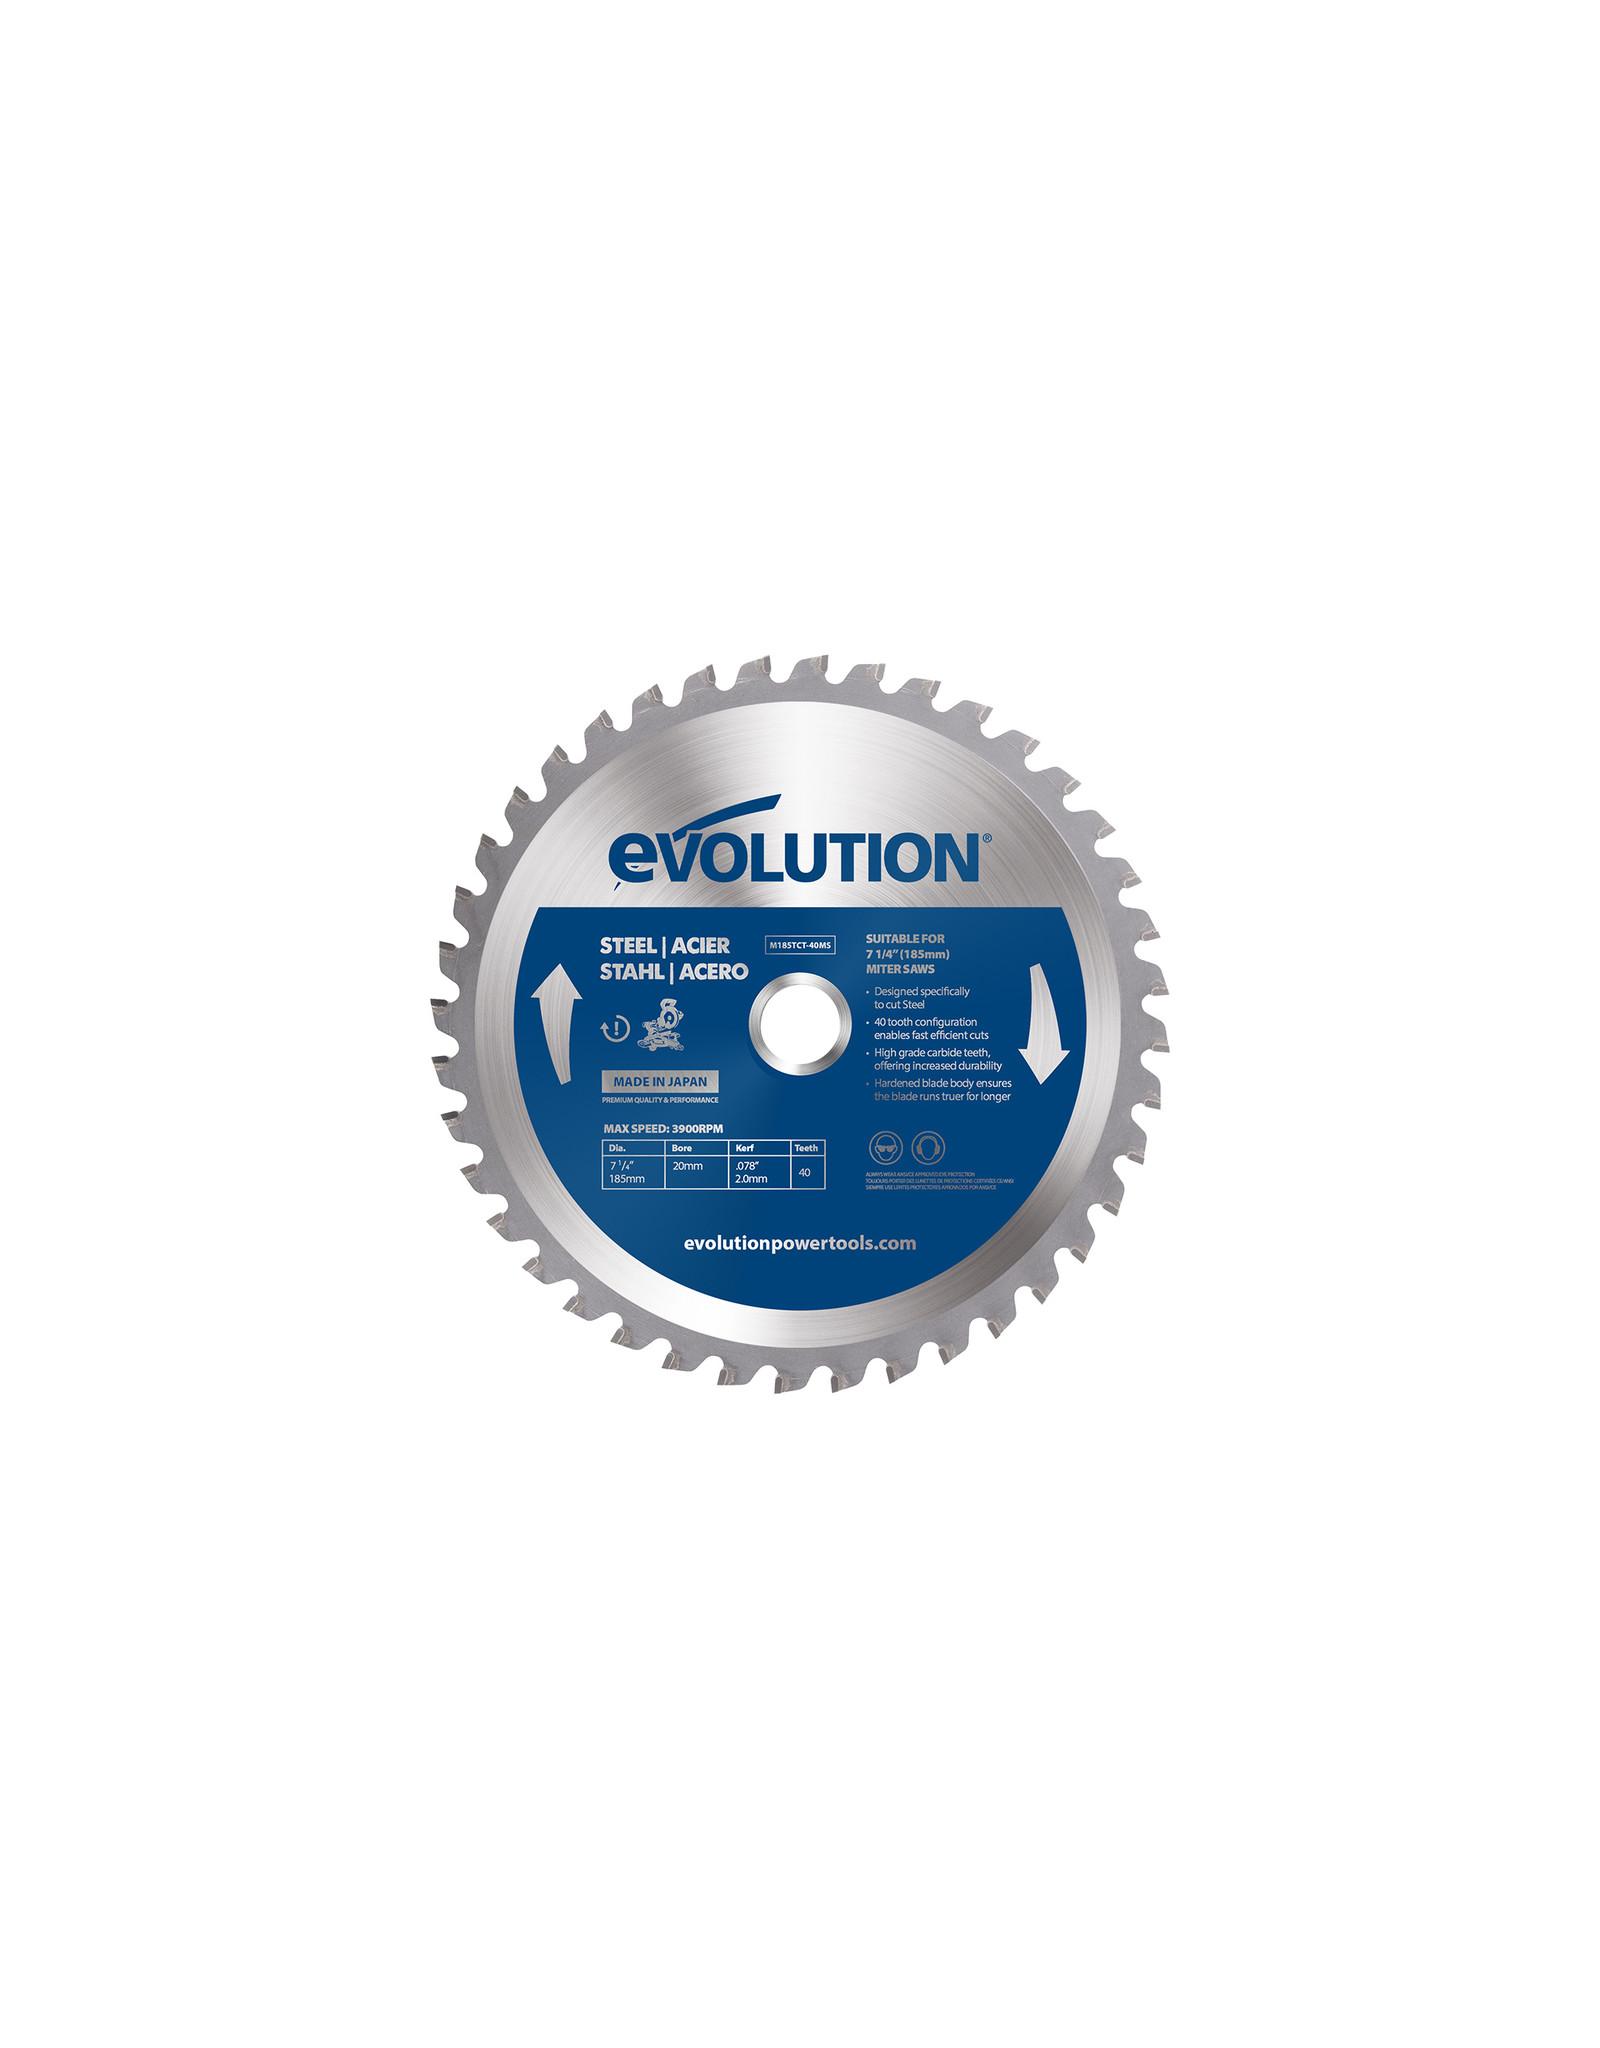 Evolution Power Tools Steel Line STAHL KLINGE 185 MM